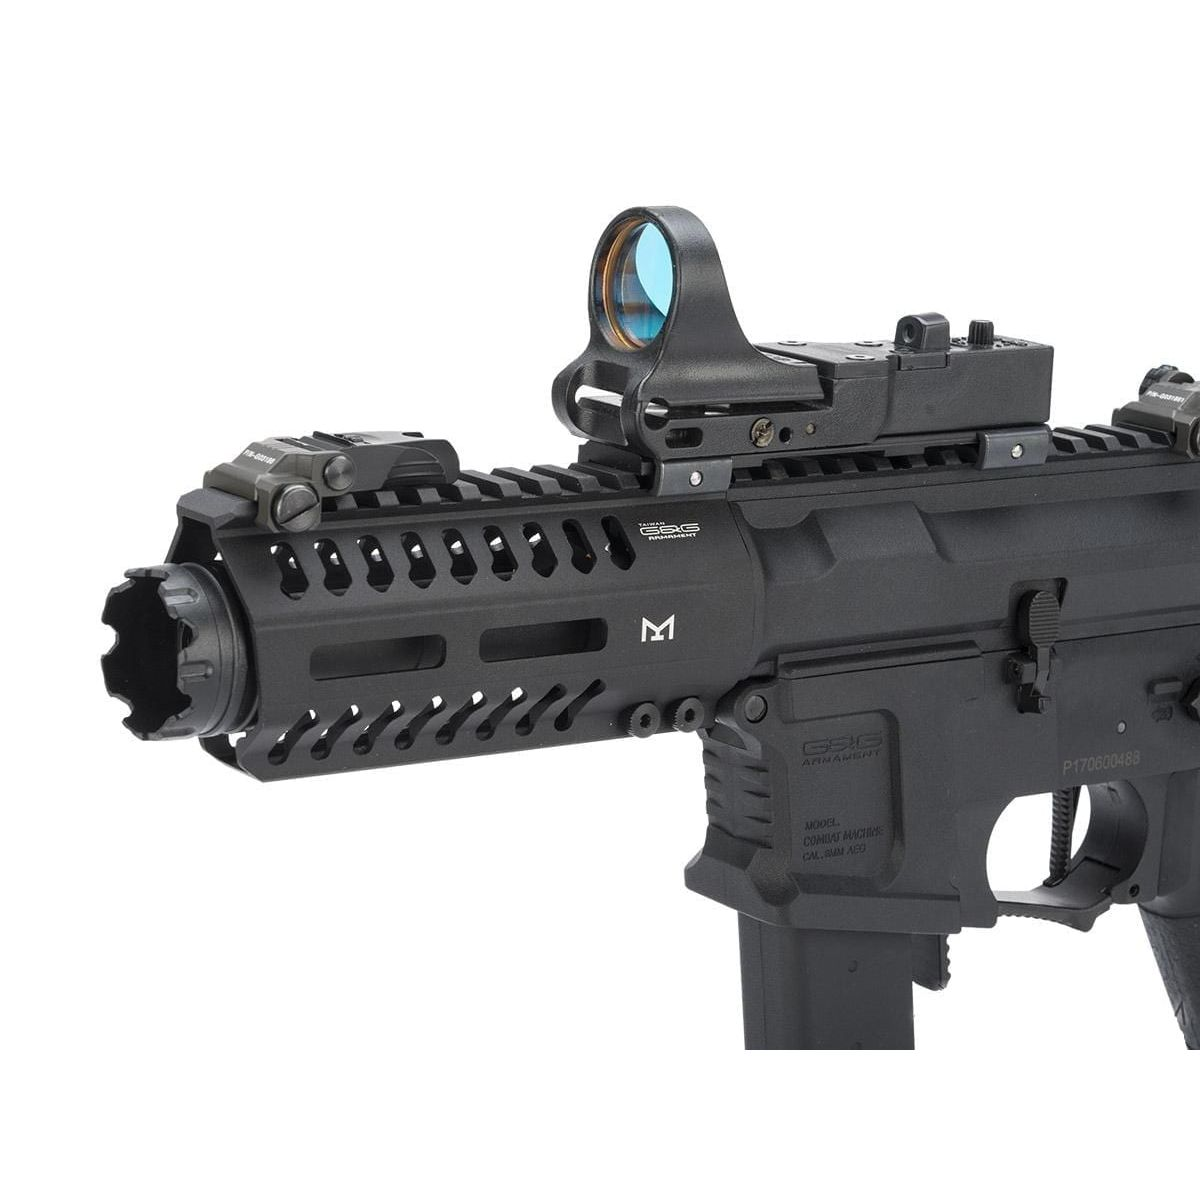 GG CM16 ARP9 CQB CARBINE AIRSOFT AEG BLACK